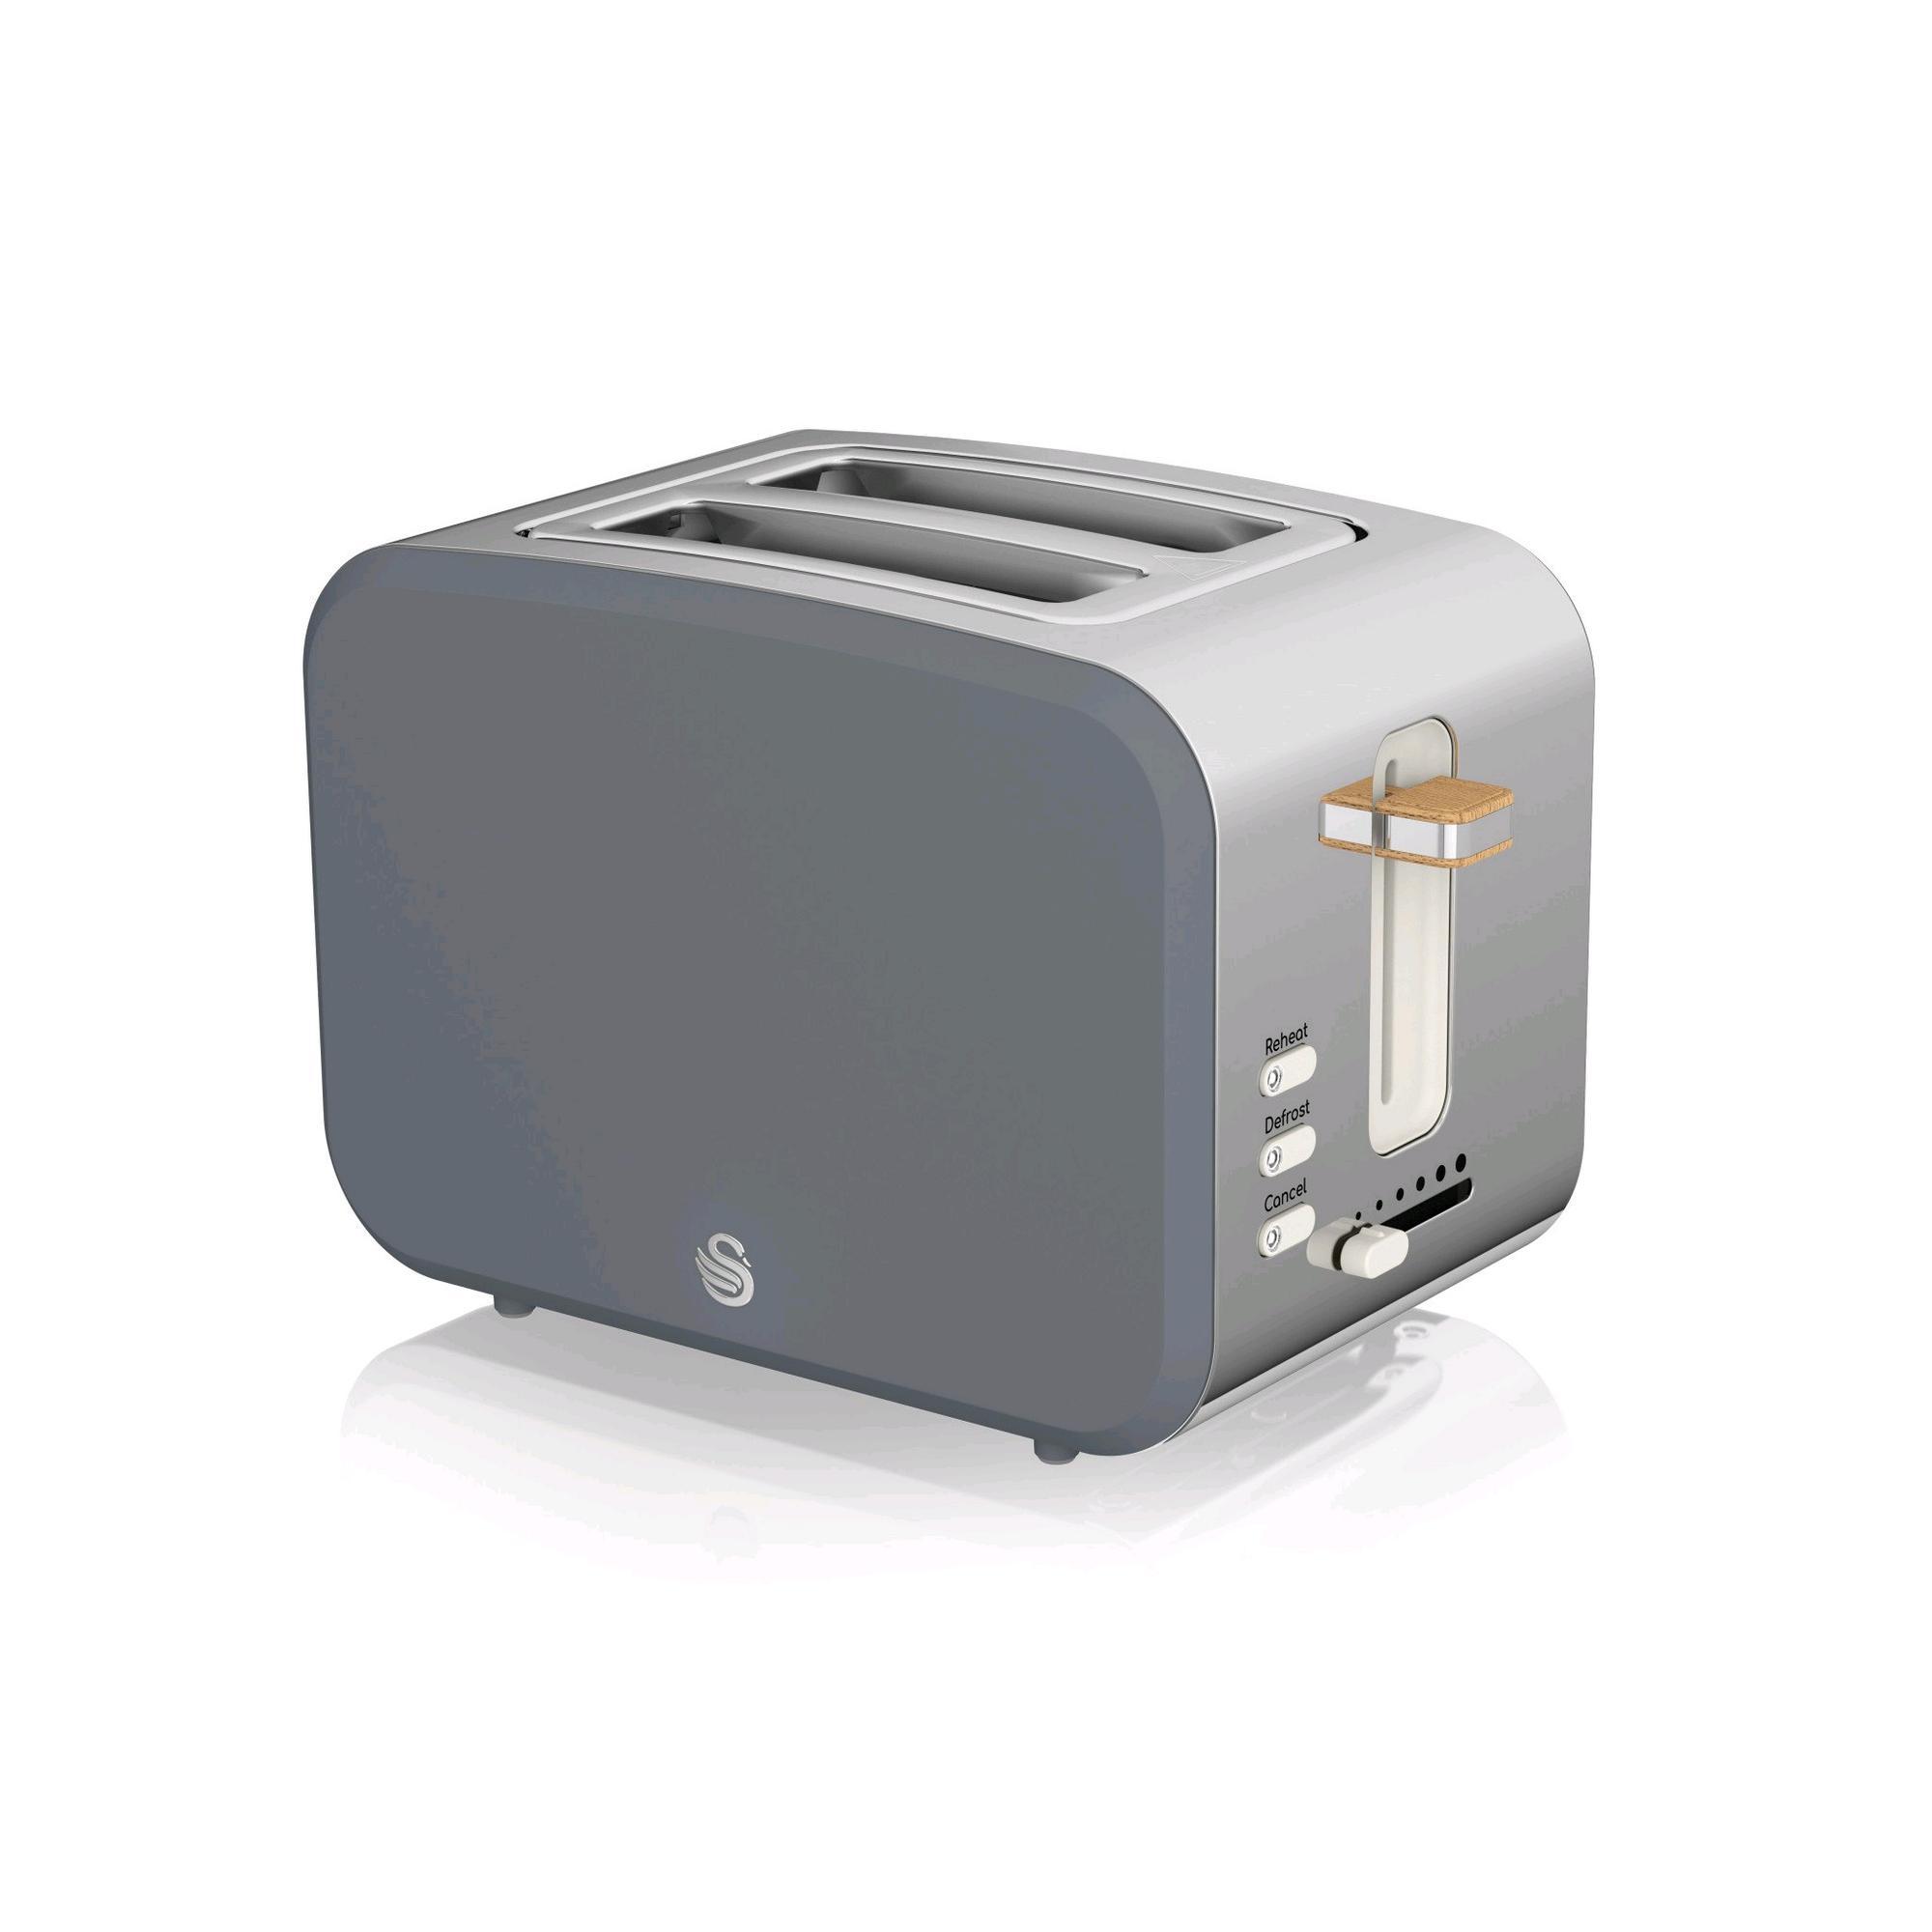 Swan Nordic 2 Slice Toaster Grey